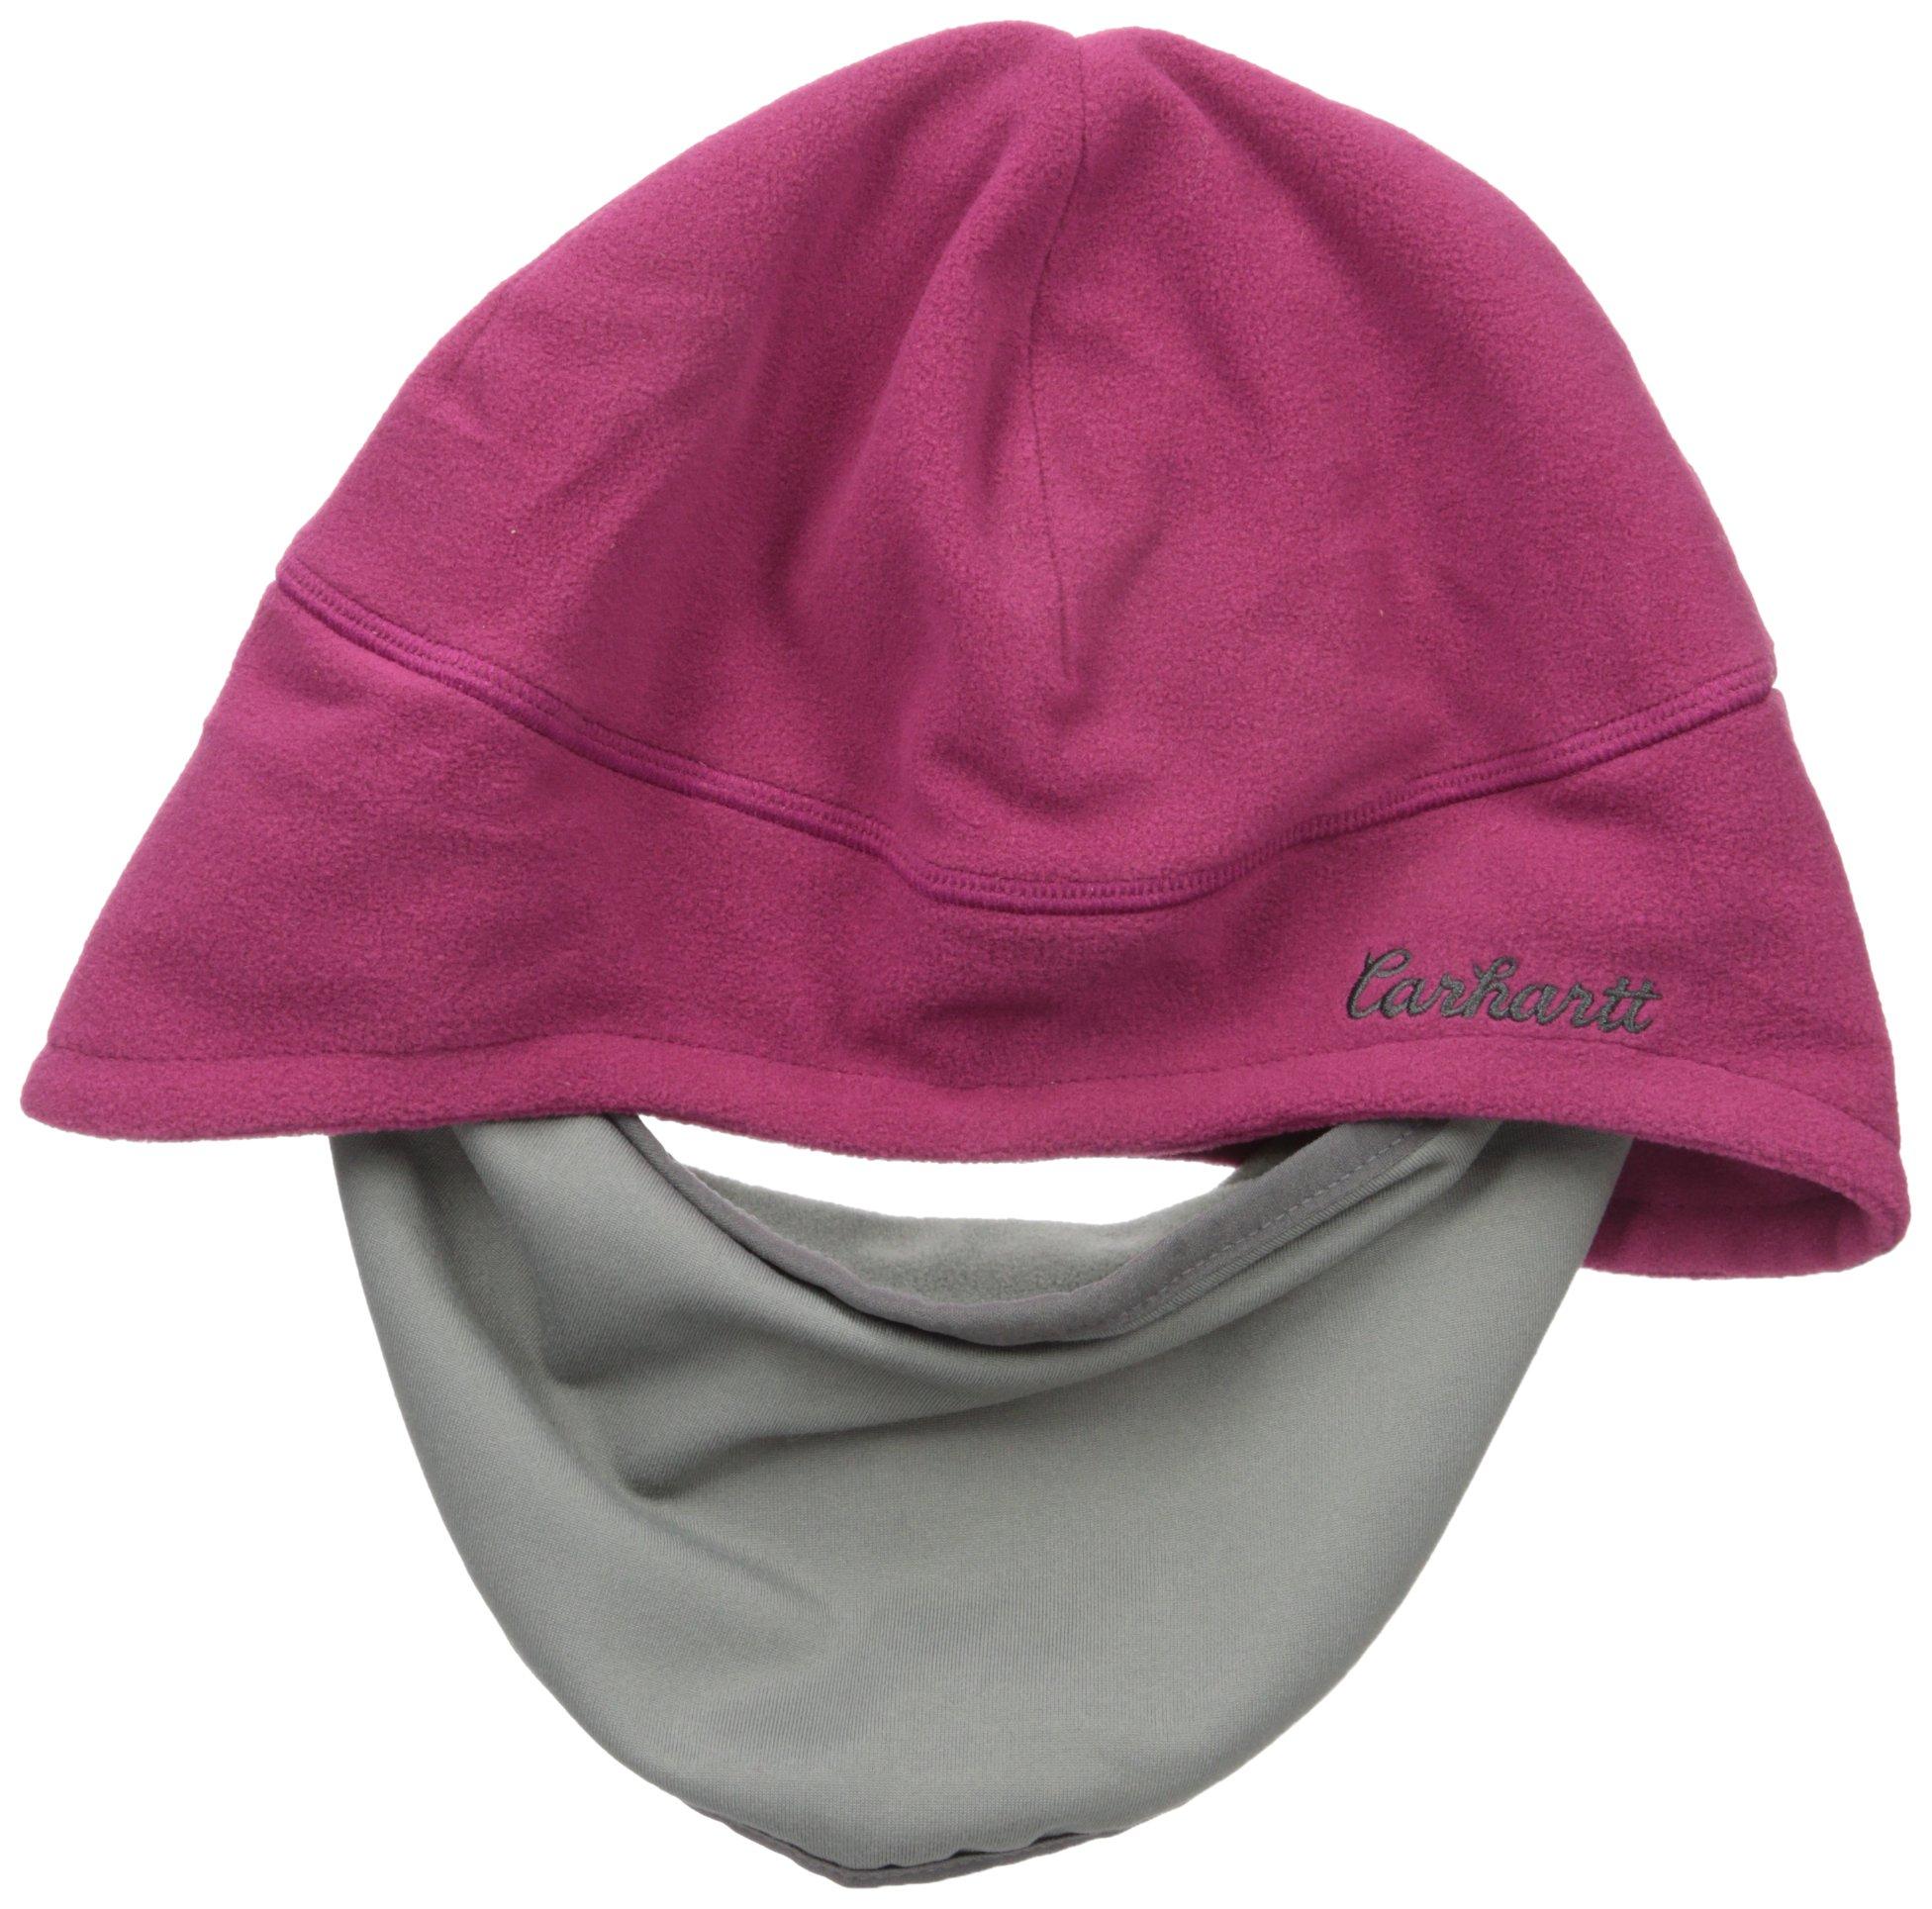 Carhartt Women's Gretna Fleece 2 in 1 Hat and Face Mask, Raspberry, One Size by Carhartt